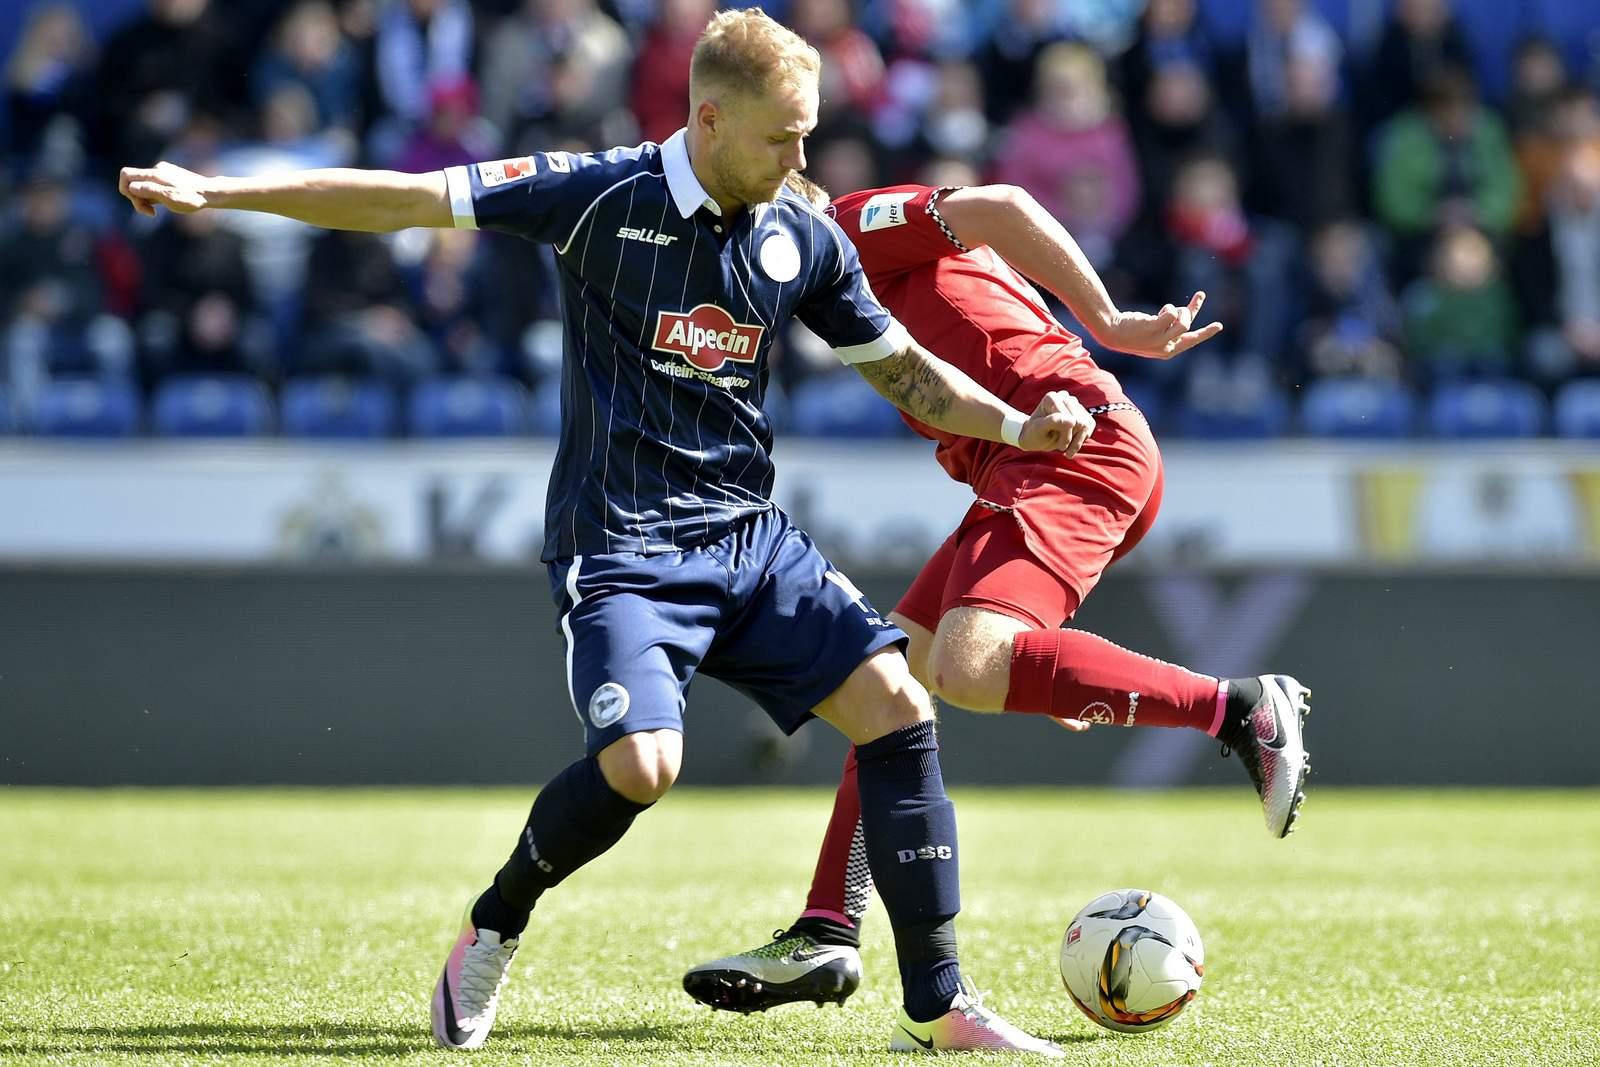 Felix Burmeister am Ball für Arminia Bielefeld